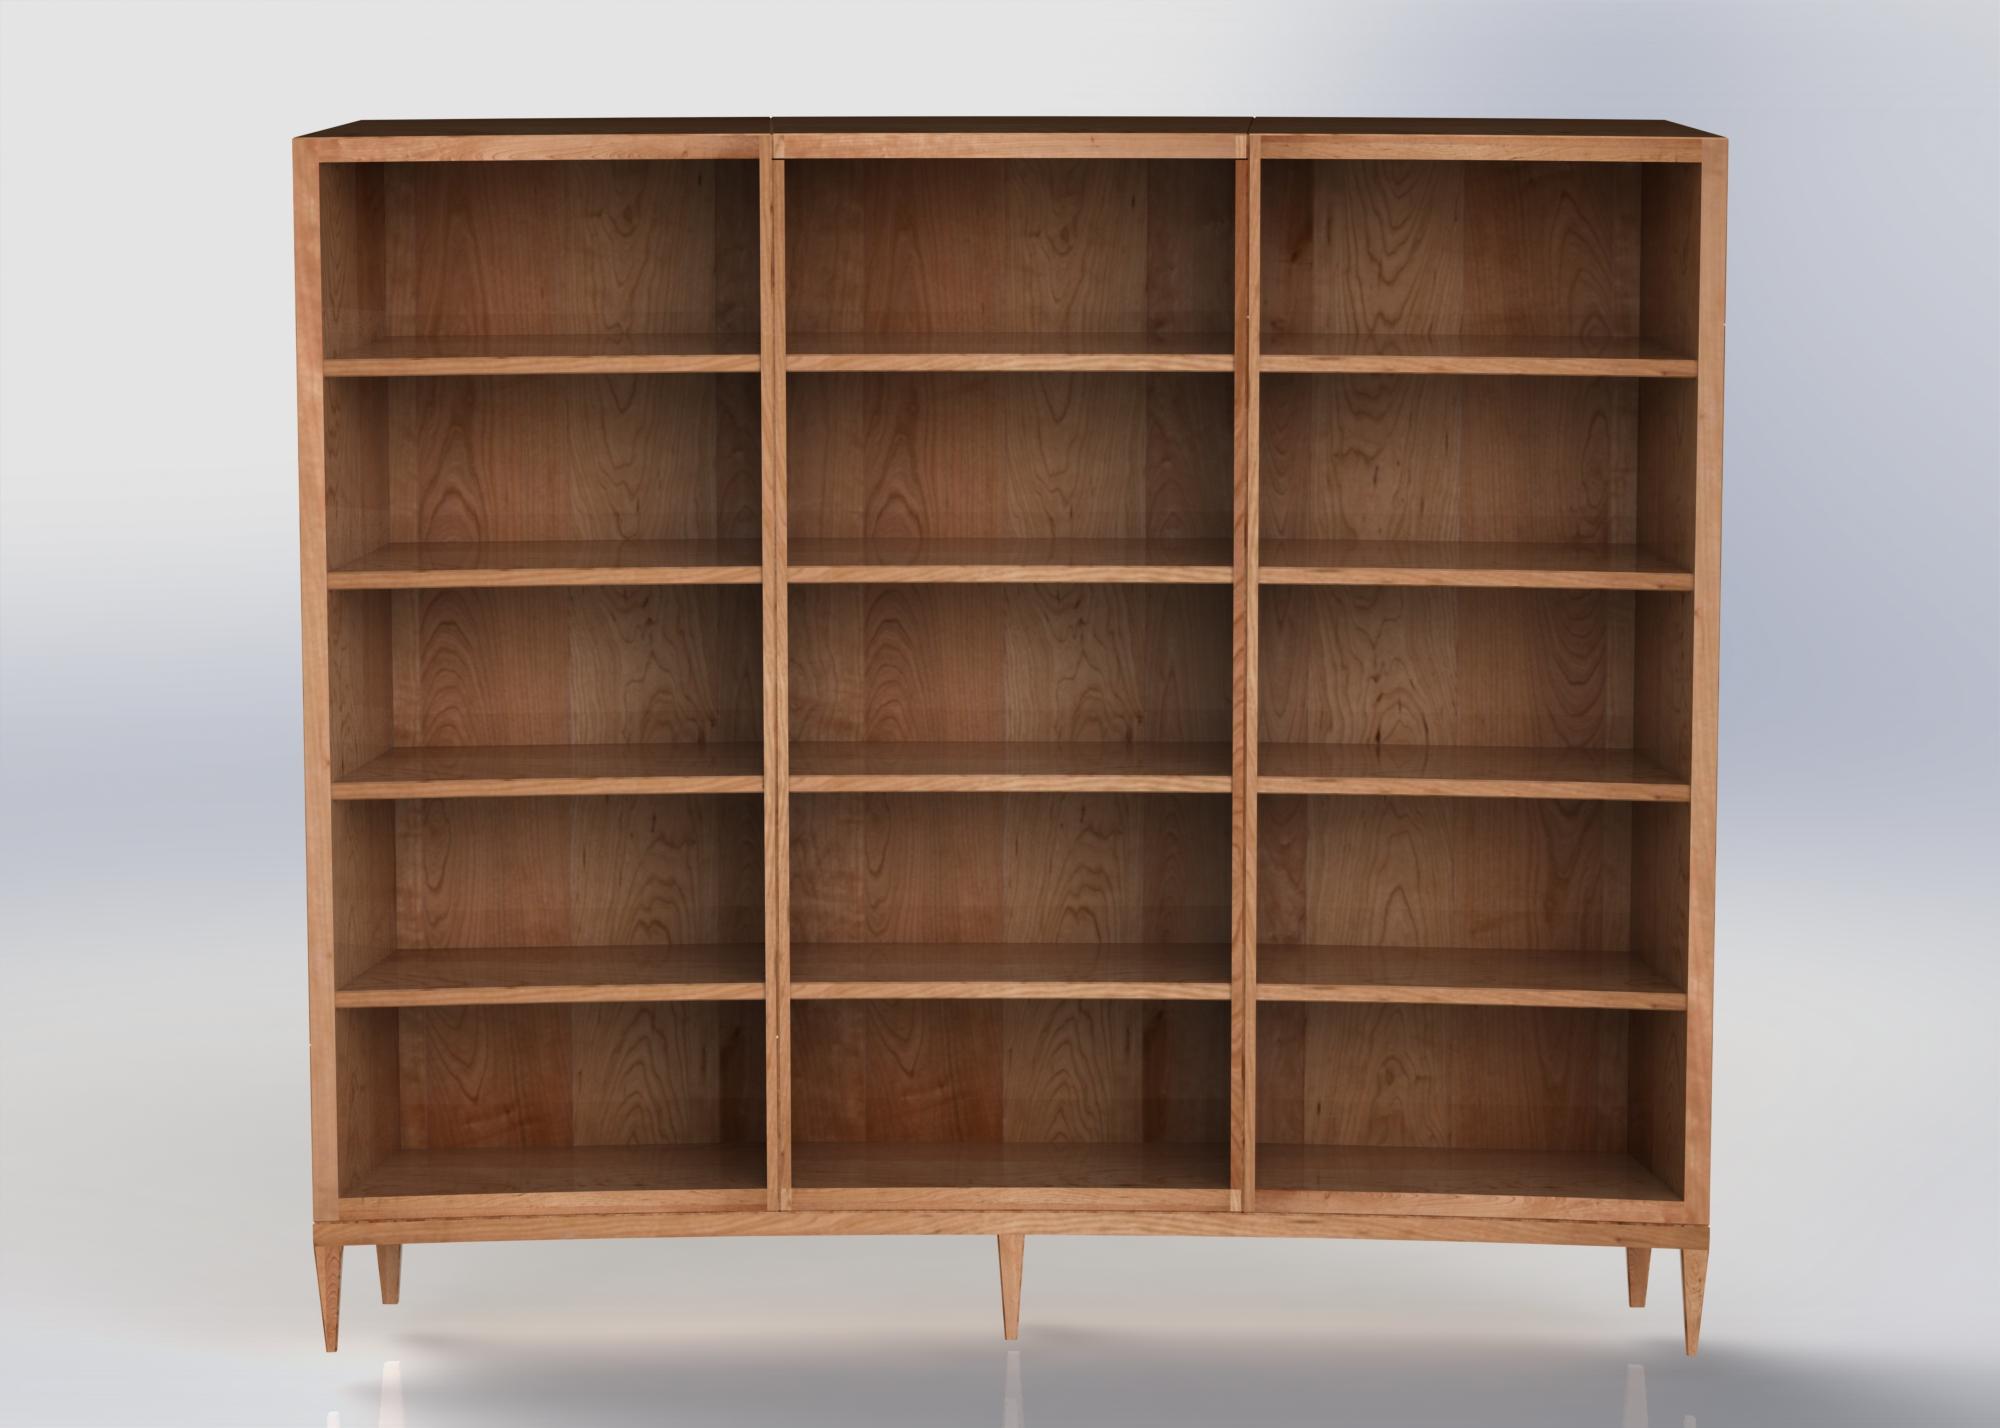 3_Part_Curved_Bookshelf_7_Small_Legs.JPG